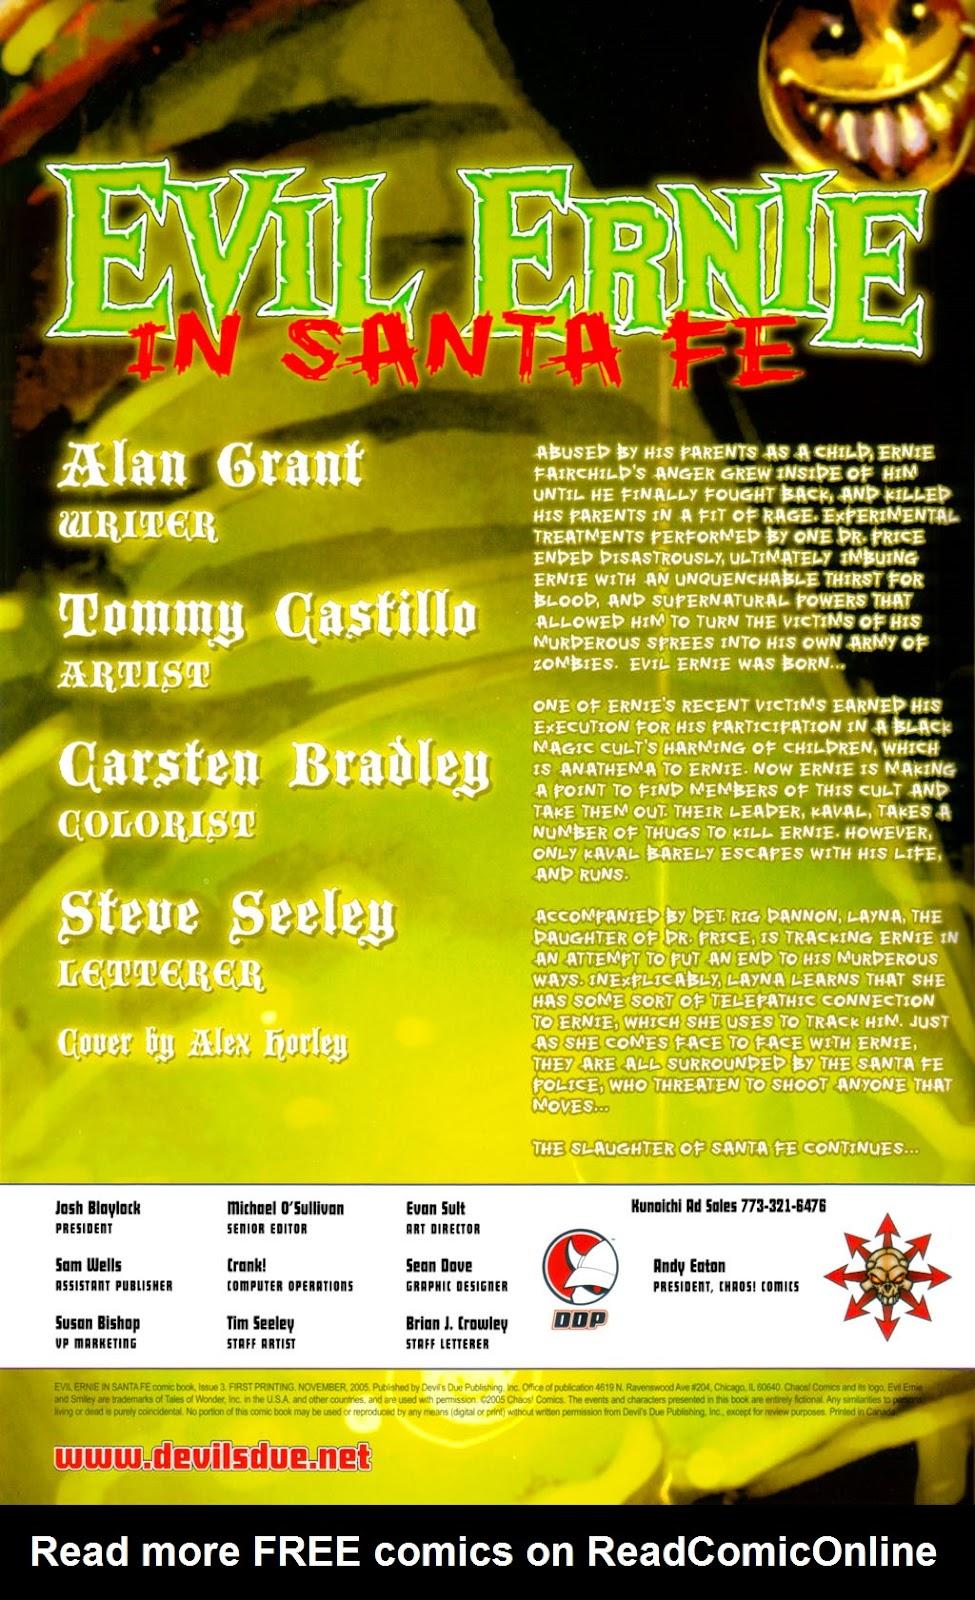 Read online Evil Ernie in Santa Fe comic -  Issue #3 - 2